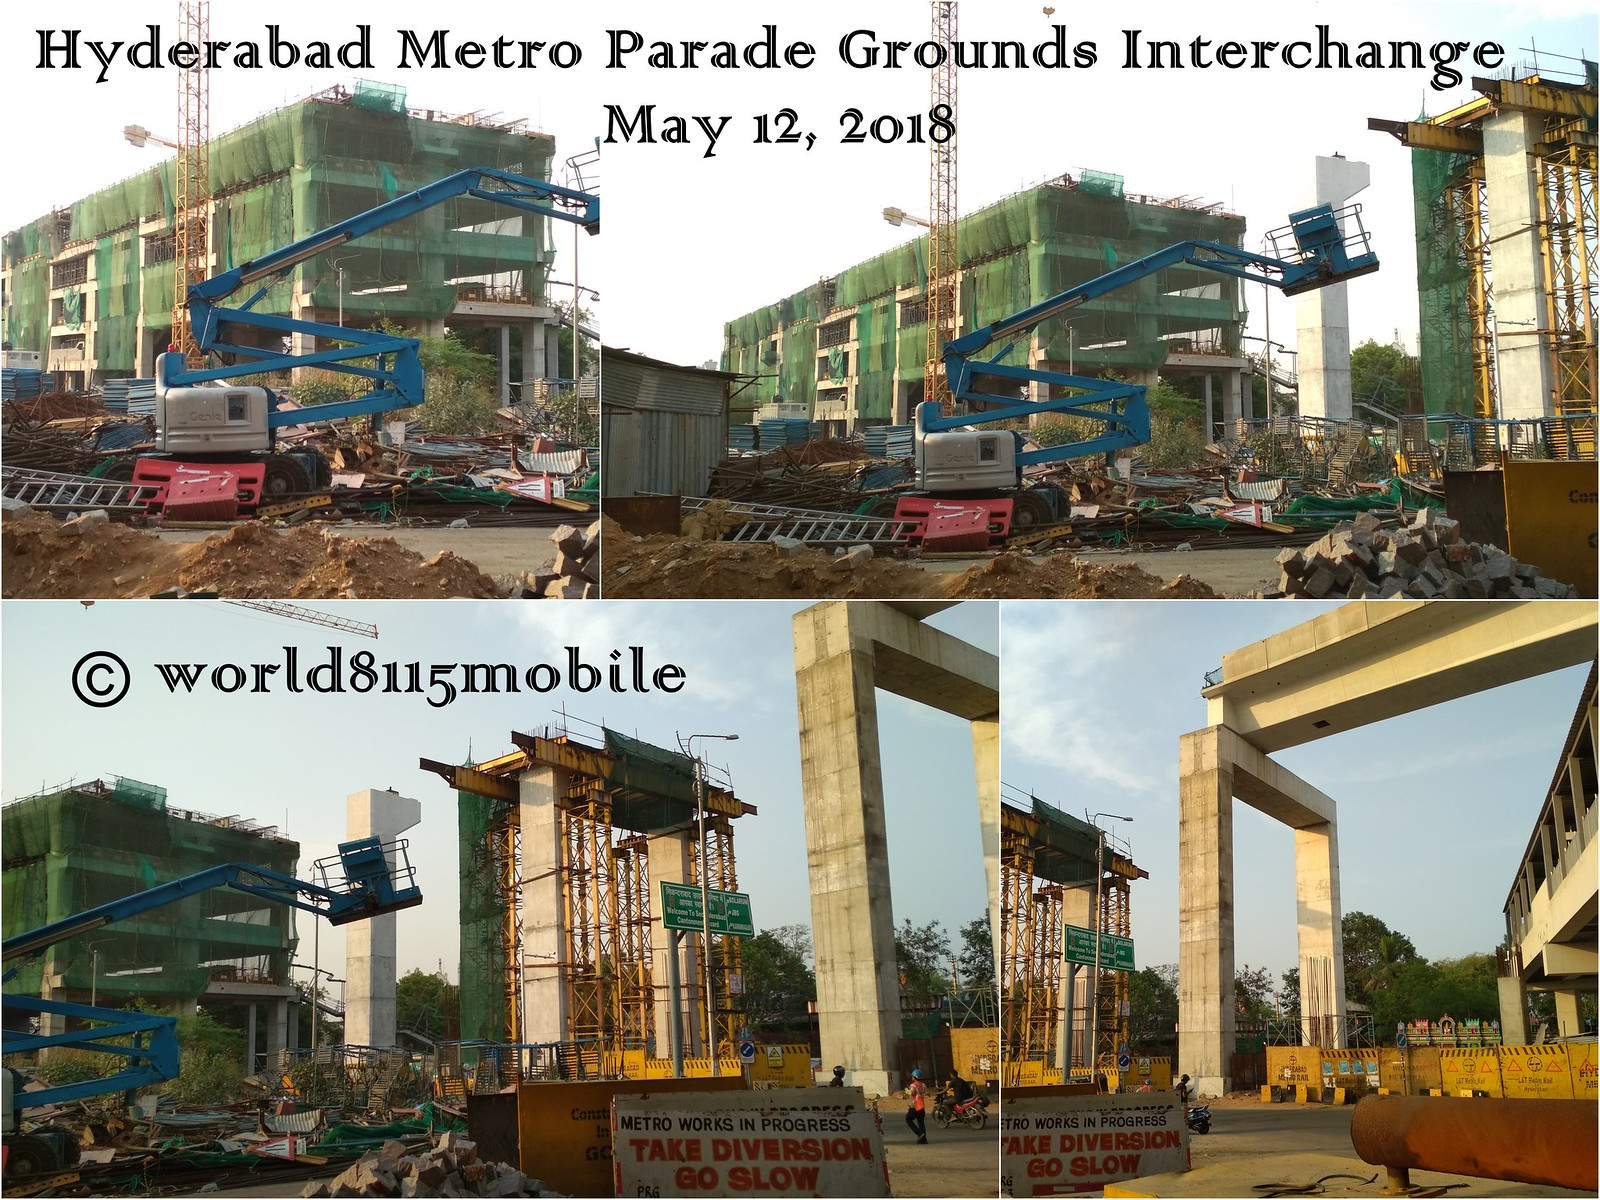 Hyderabad | Metro | హైదరాబాద్ మెట్రో - Page